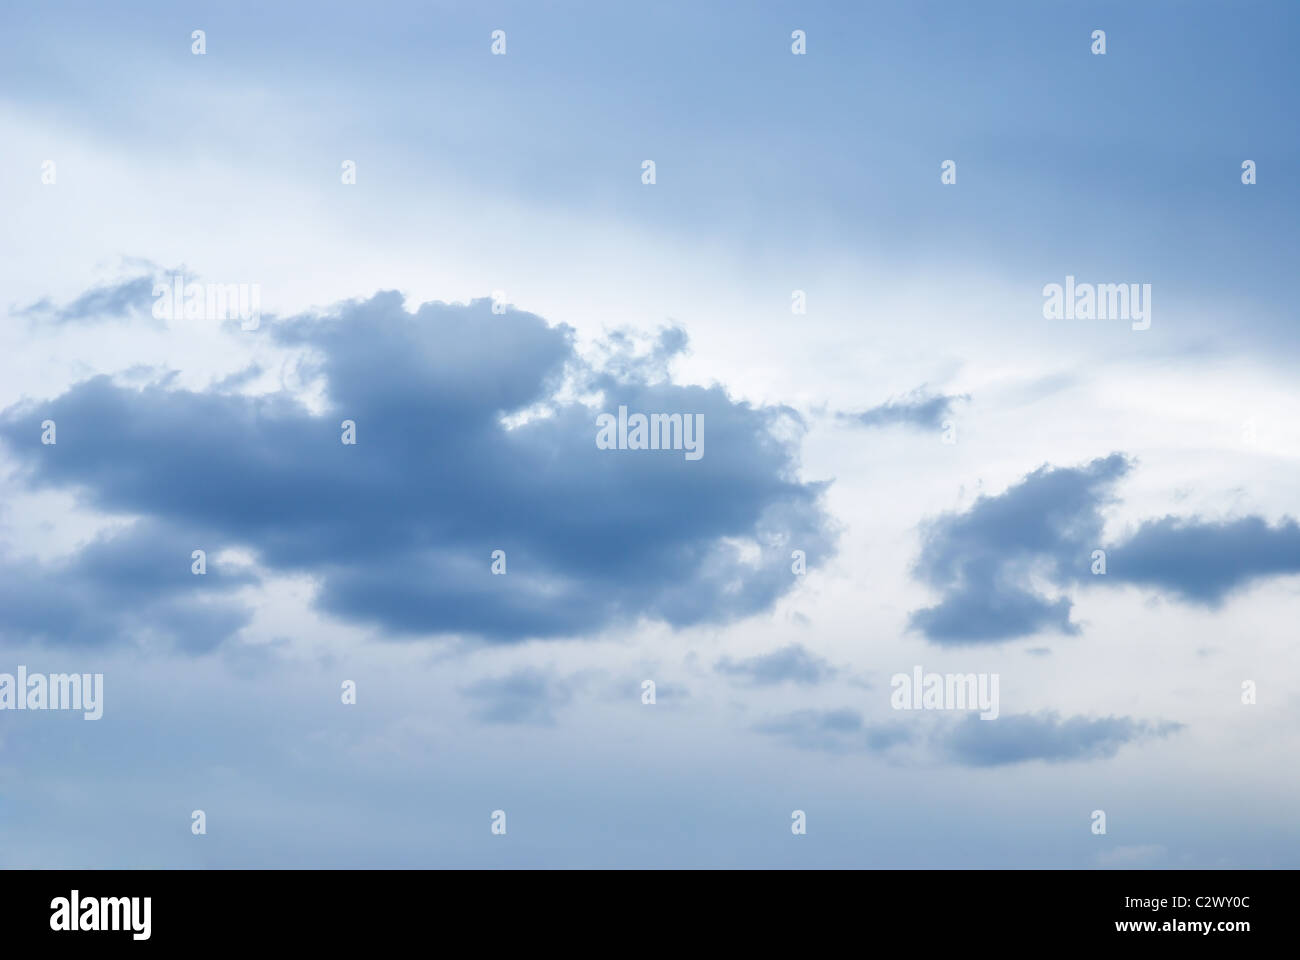 sky background - Stock Image